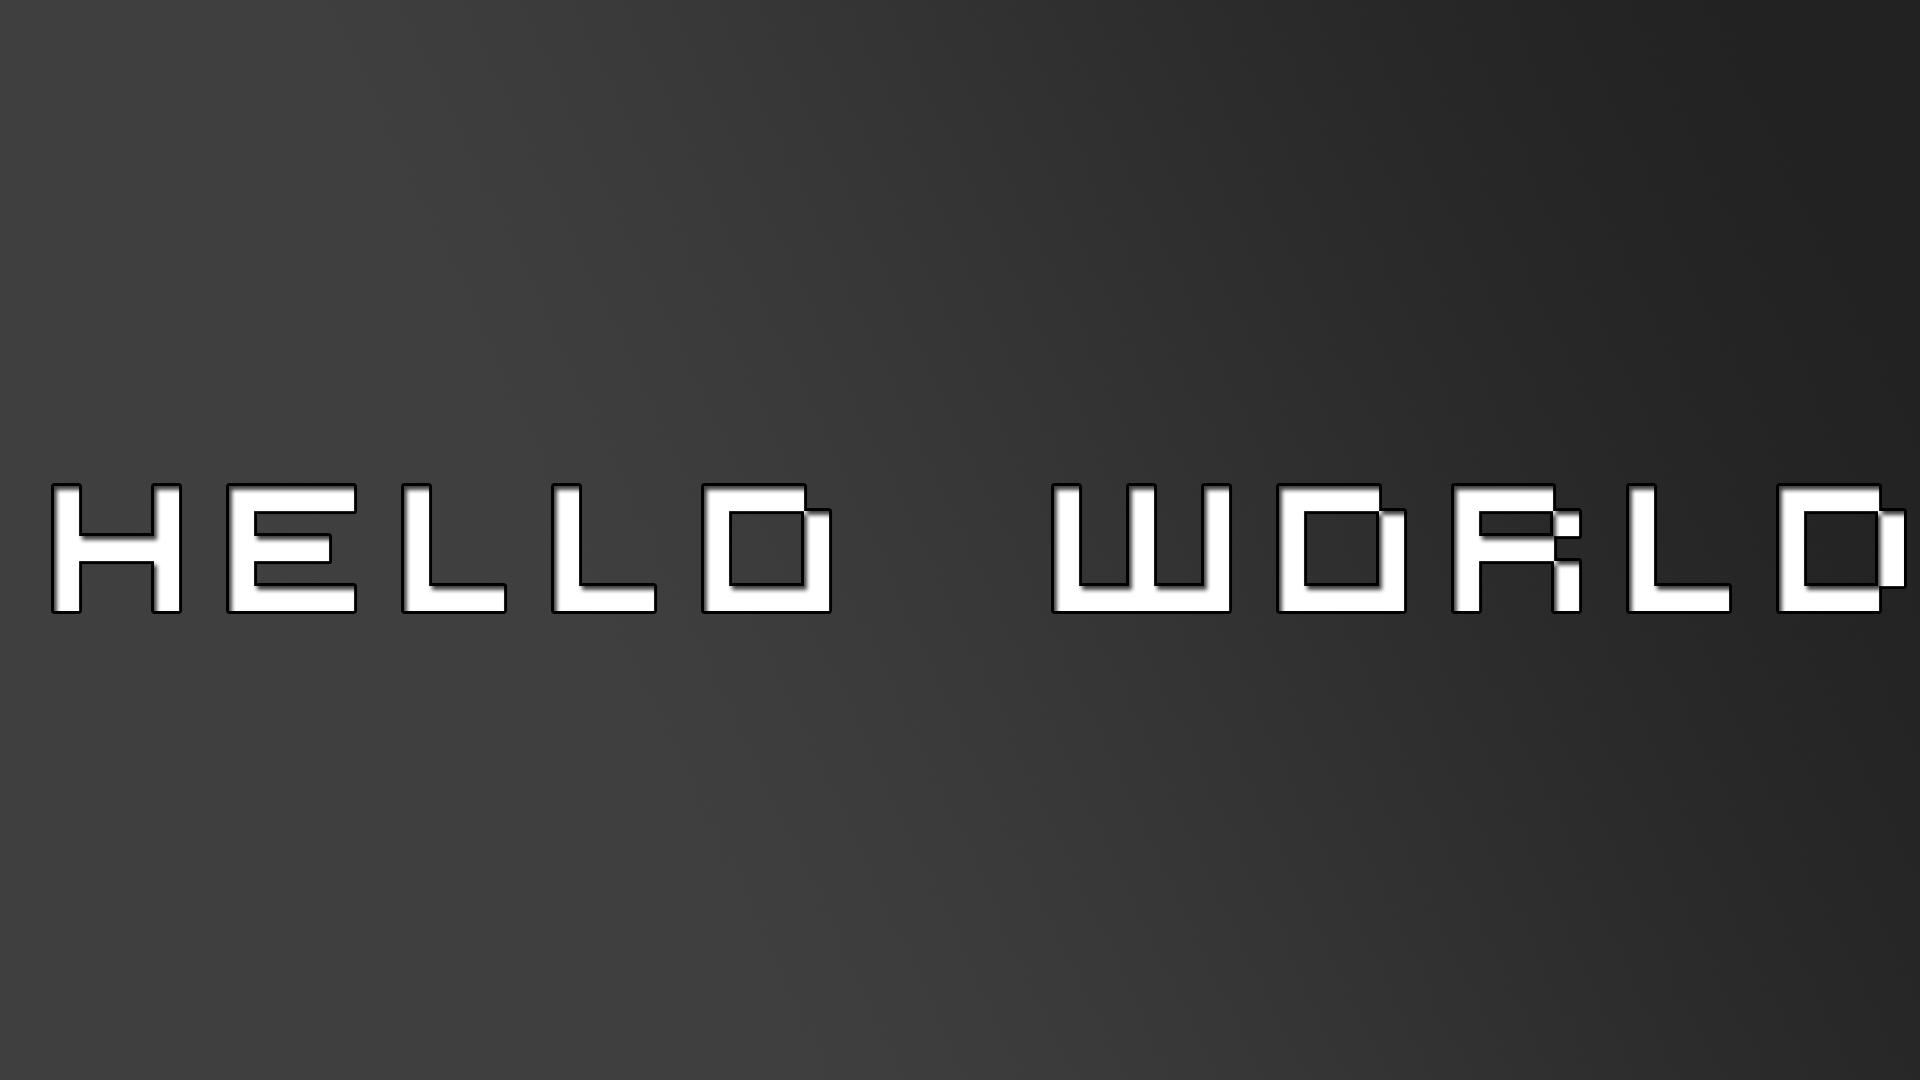 Hello World By SloppierKitty7 On DeviantArt